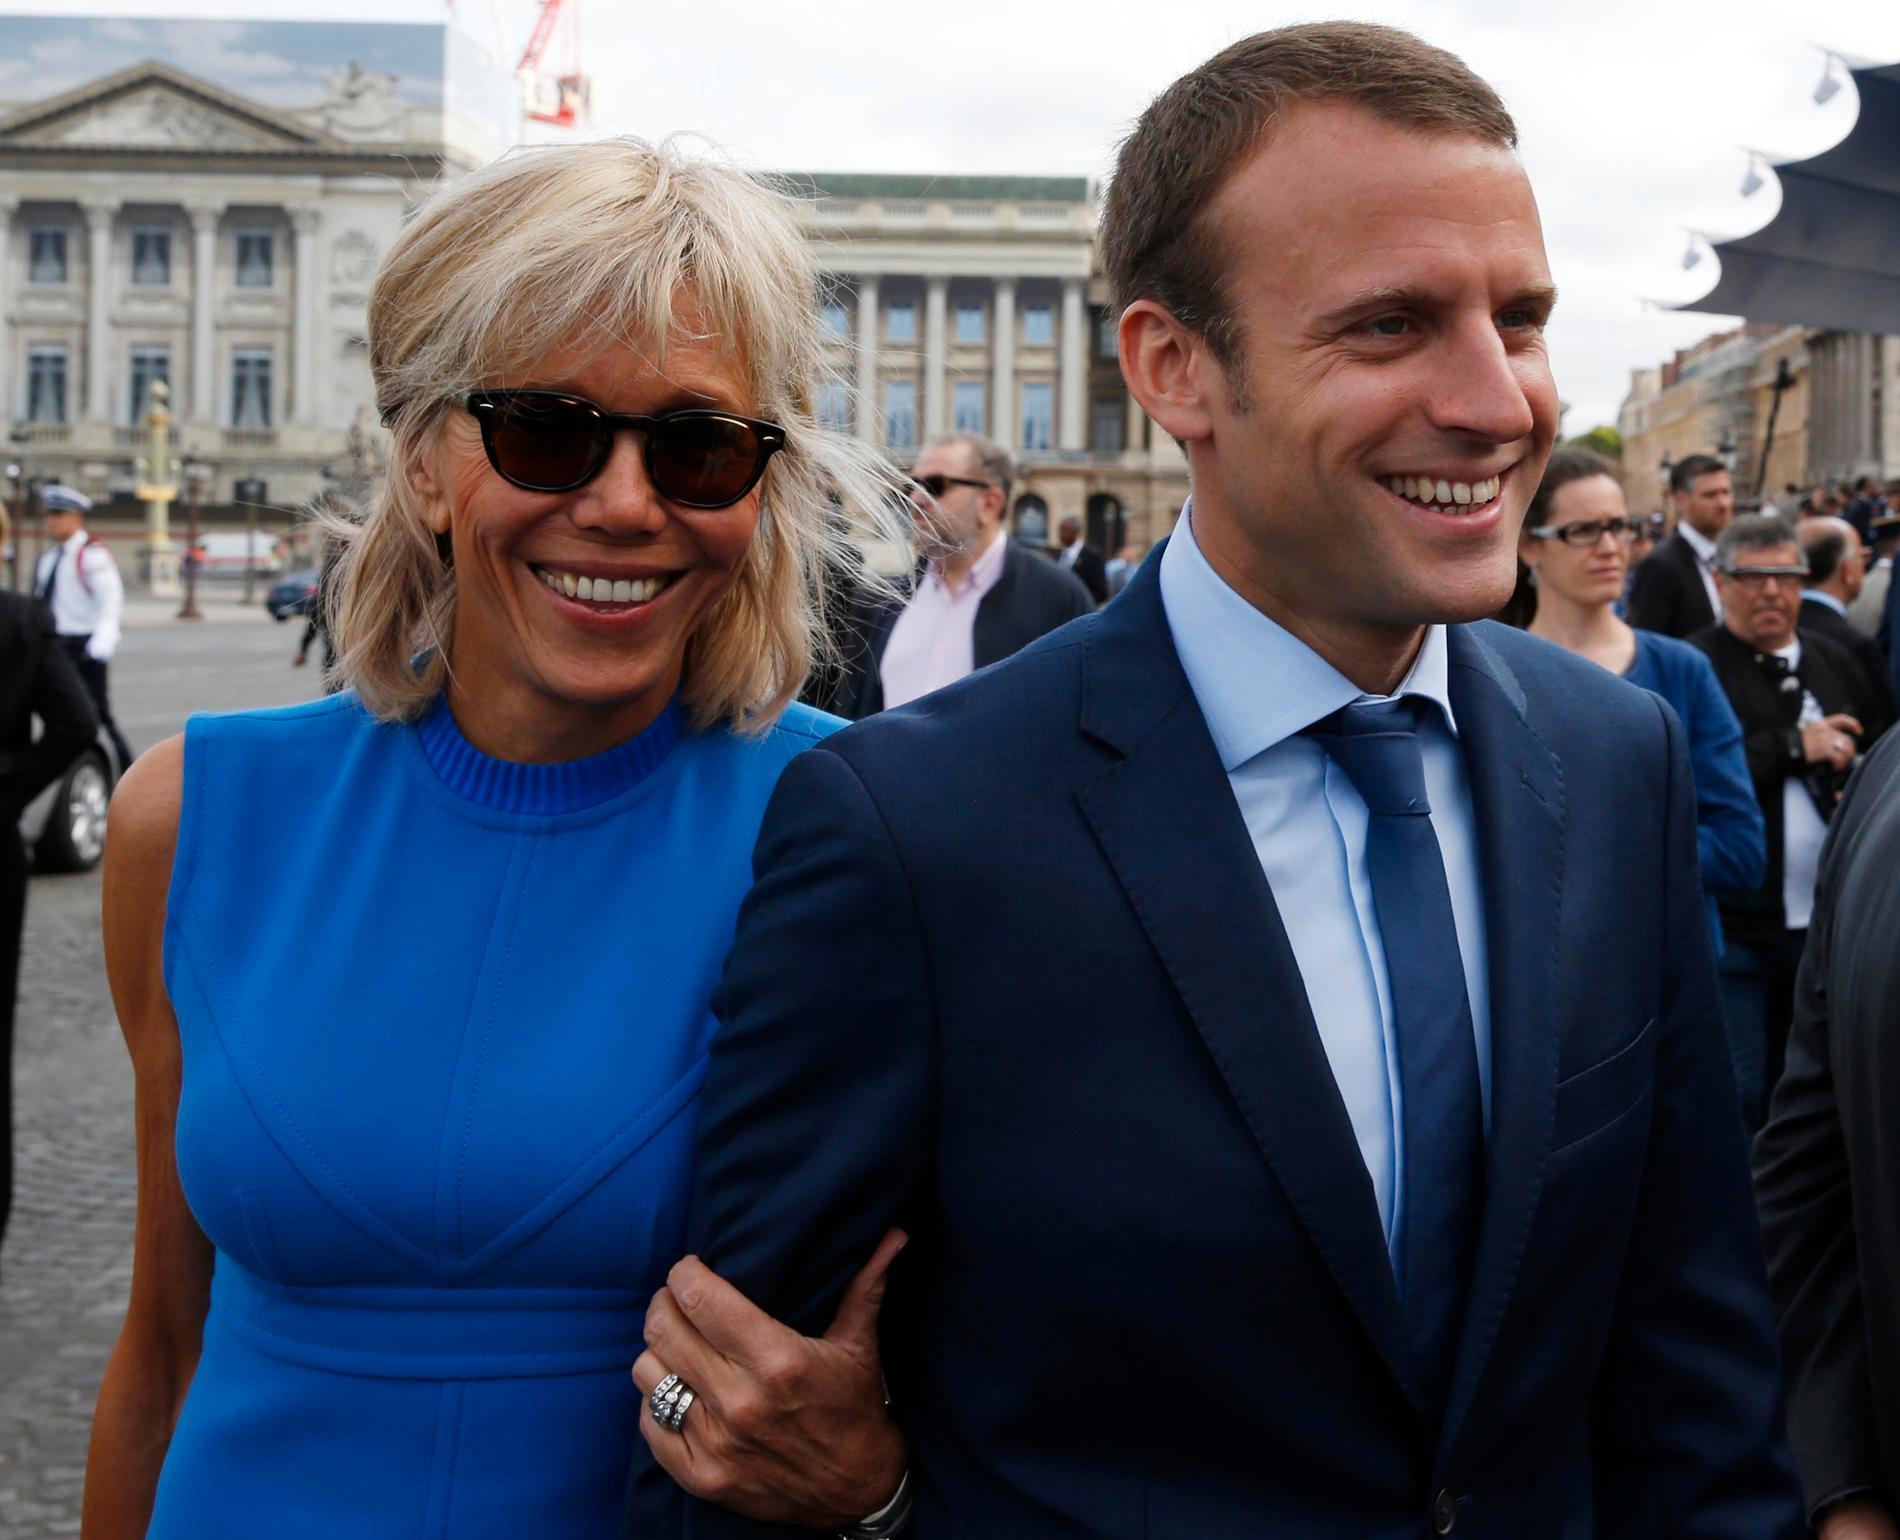 Emmanuel Macron tillsammans med sin fru Brigitte Trogneux.